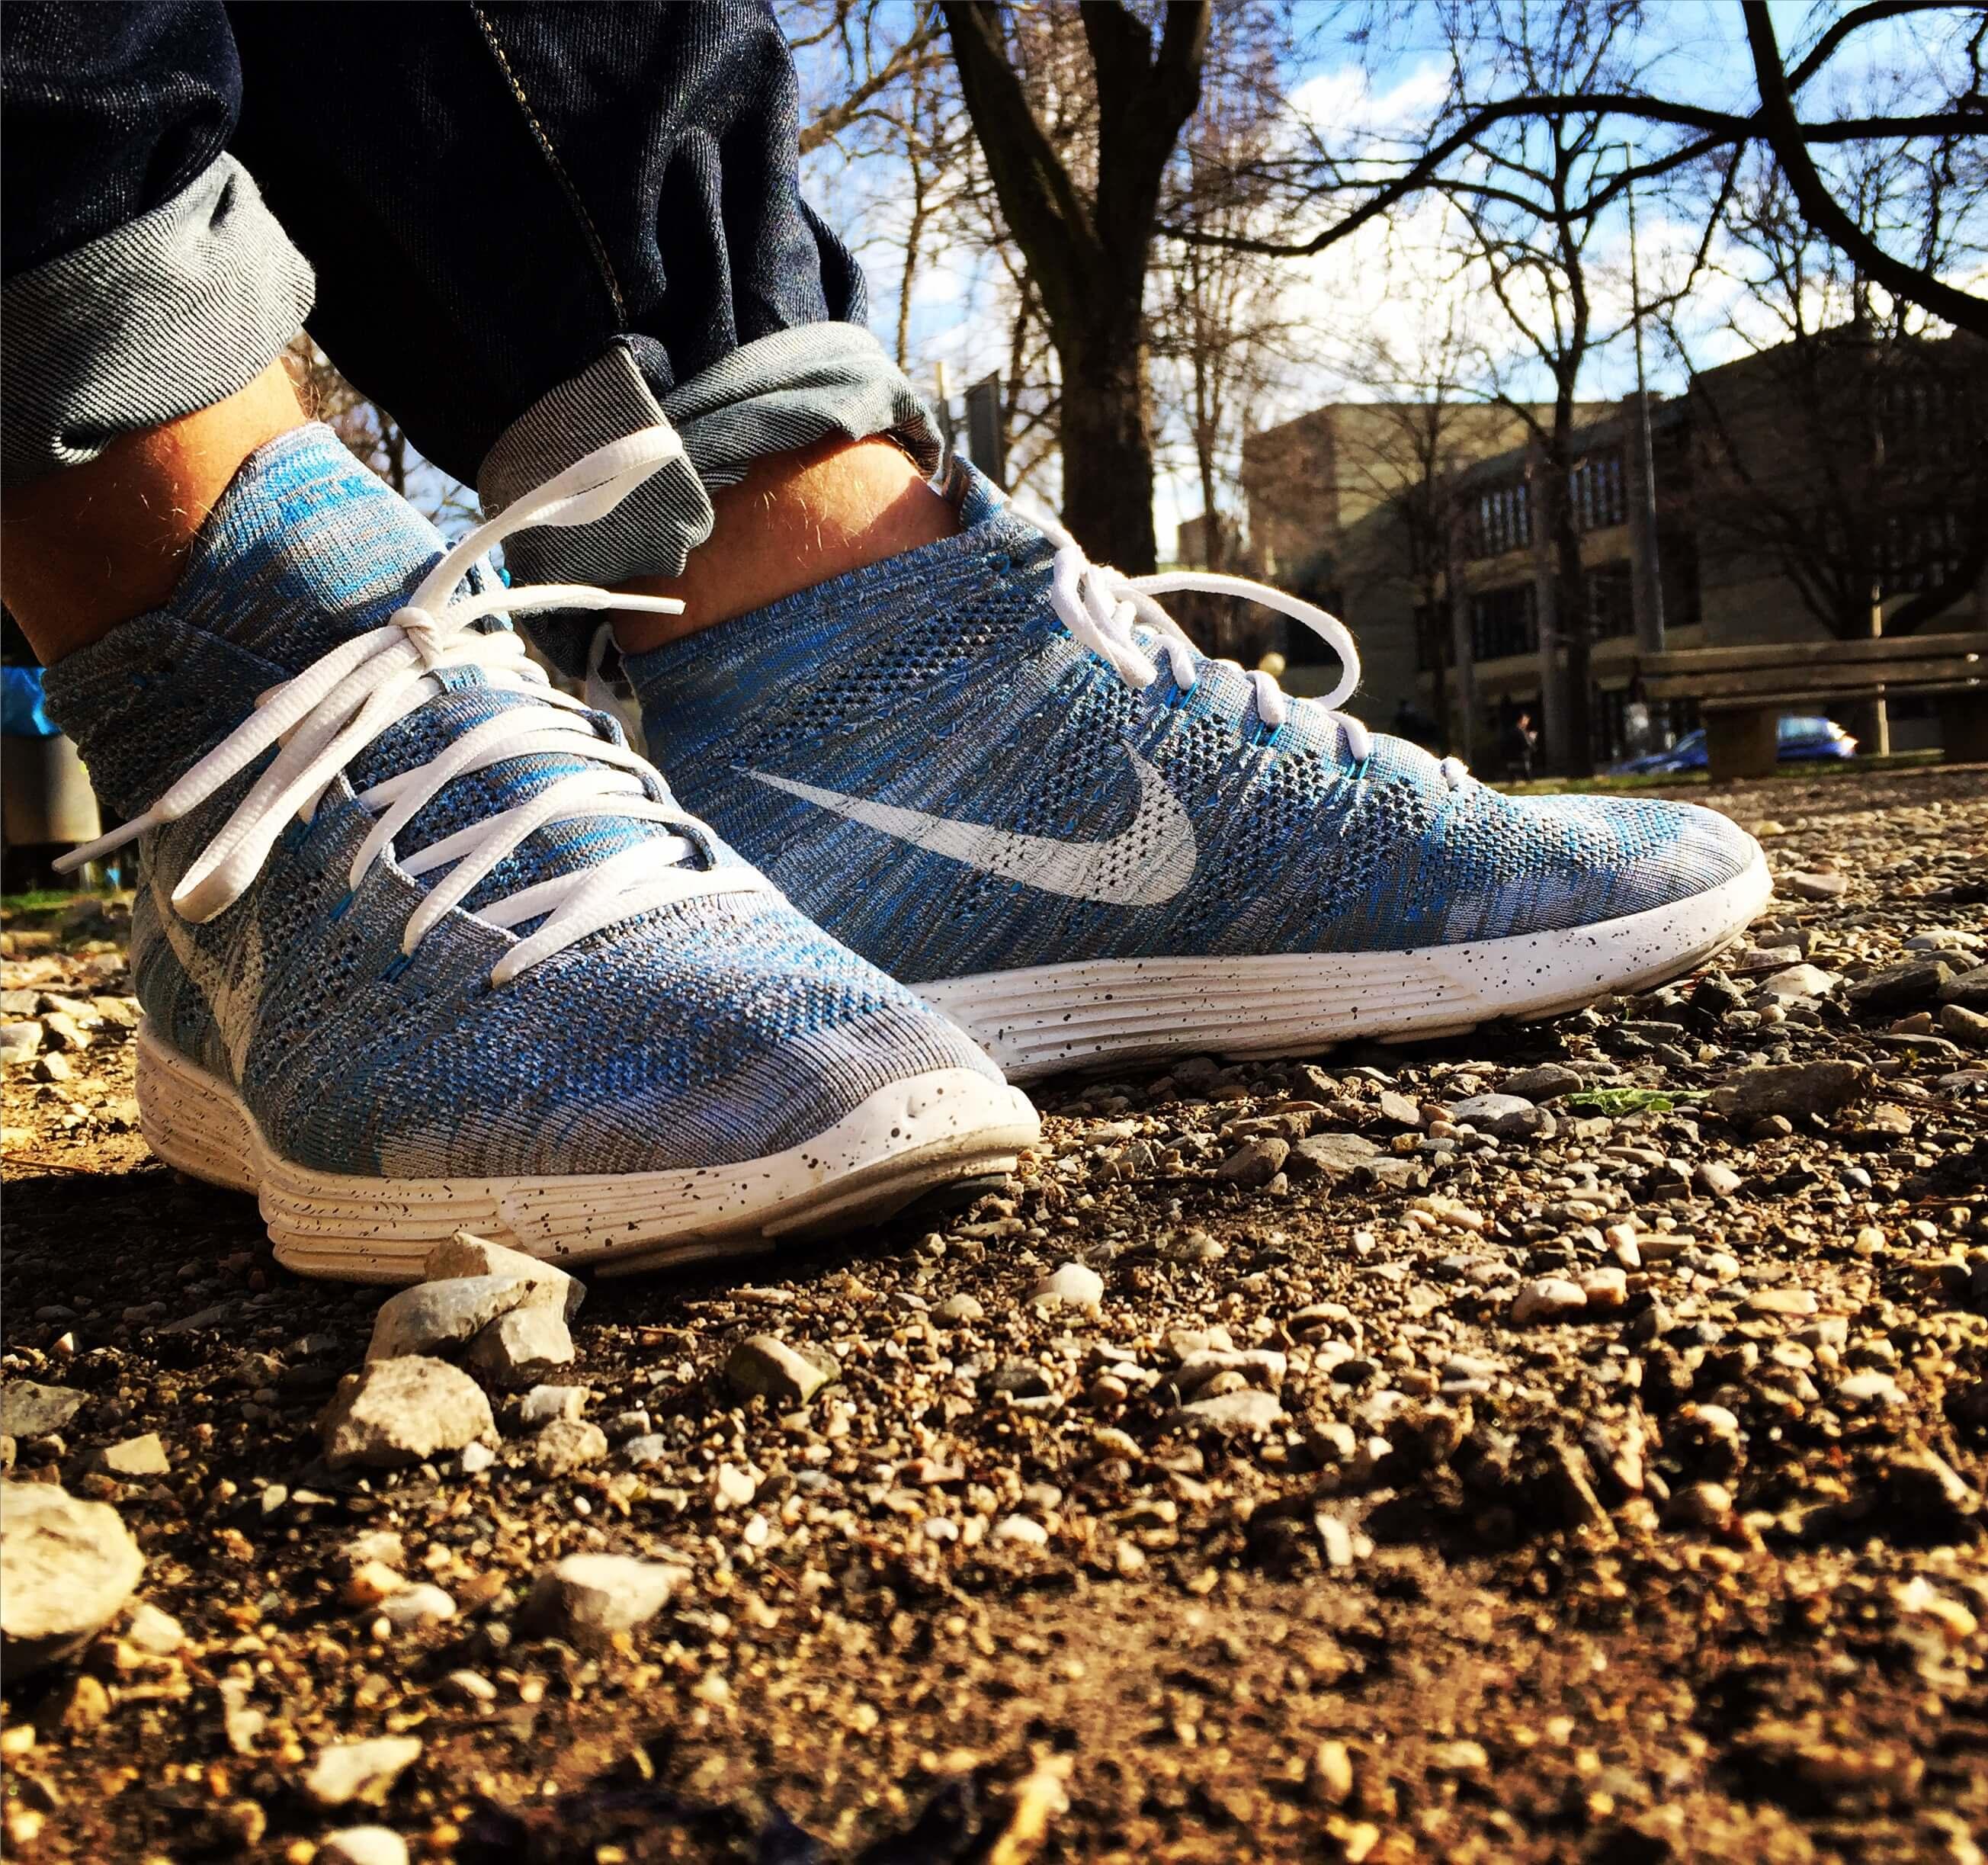 Nike-Lunar-Chukka-HTM-Angle-View-Benstah-Onfeet